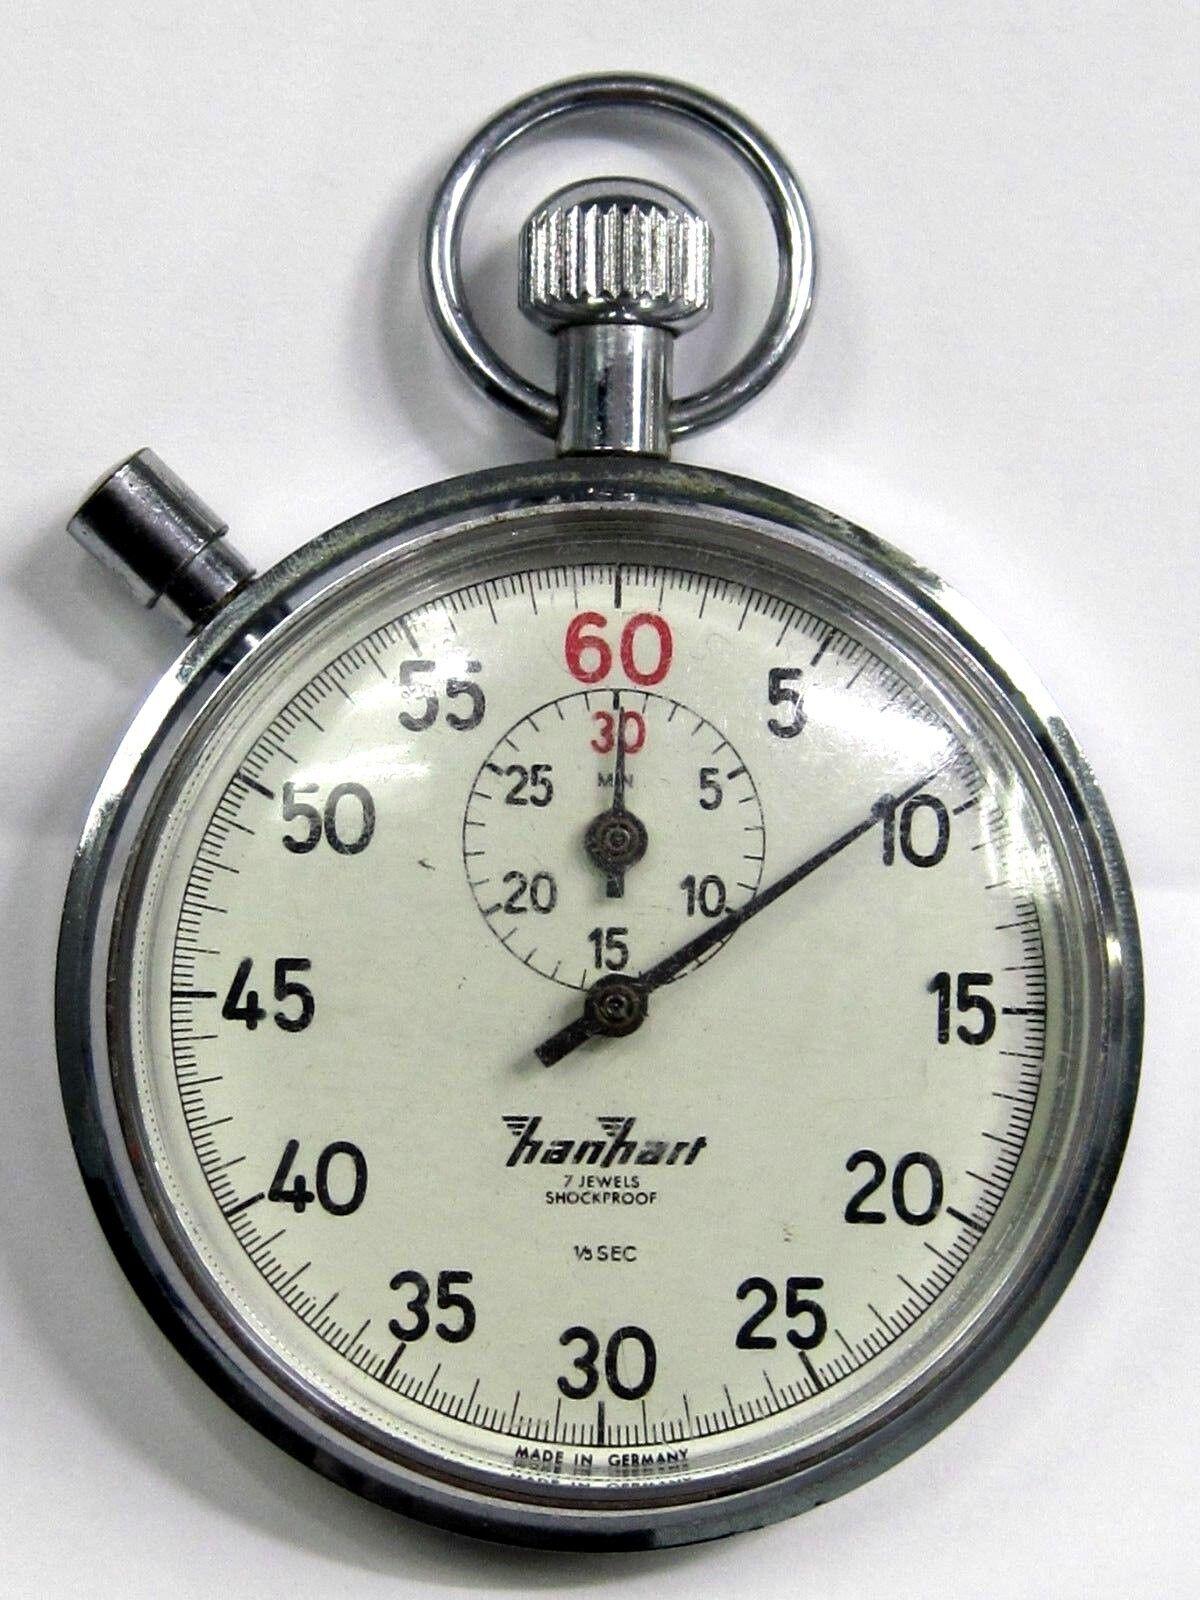 HAN HART STOPWATCH 7 JEWELS, 1960'S  WATER PredECTED, ANTIMAGNETIC